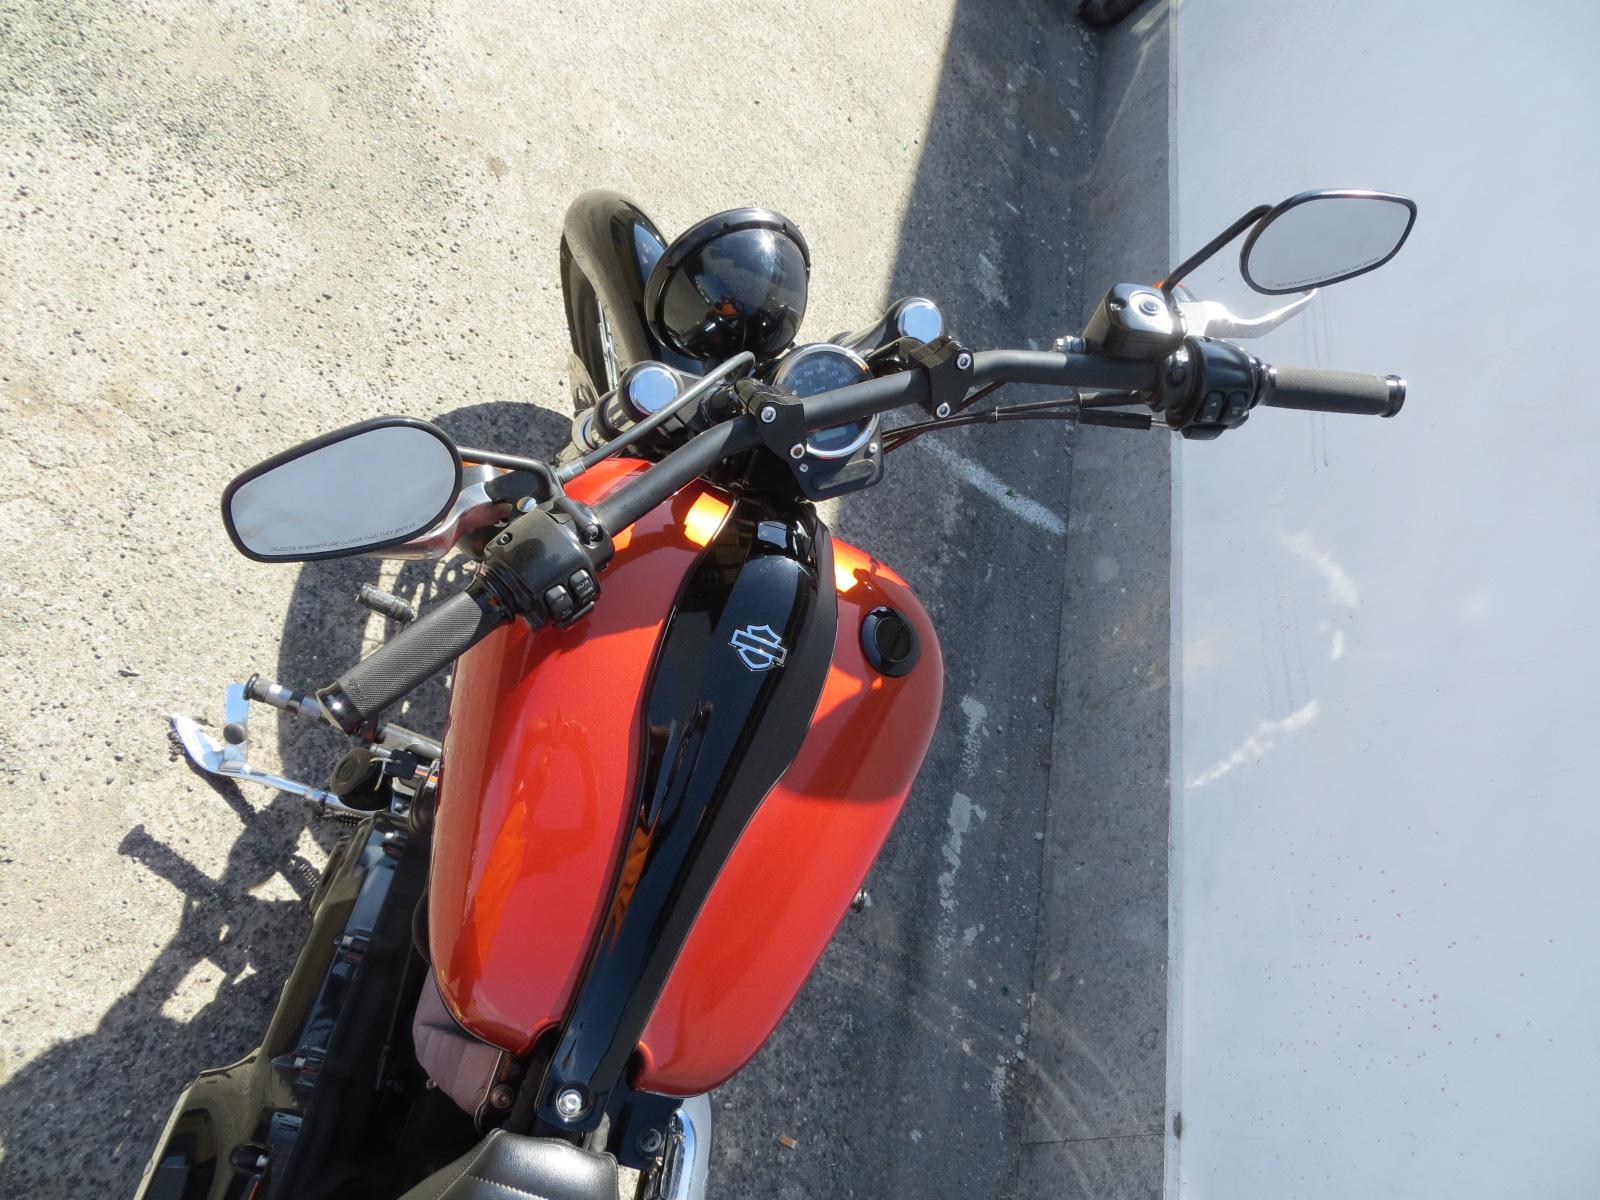 Harley-Davidson Harley-Davidson Dyna Blackline custom